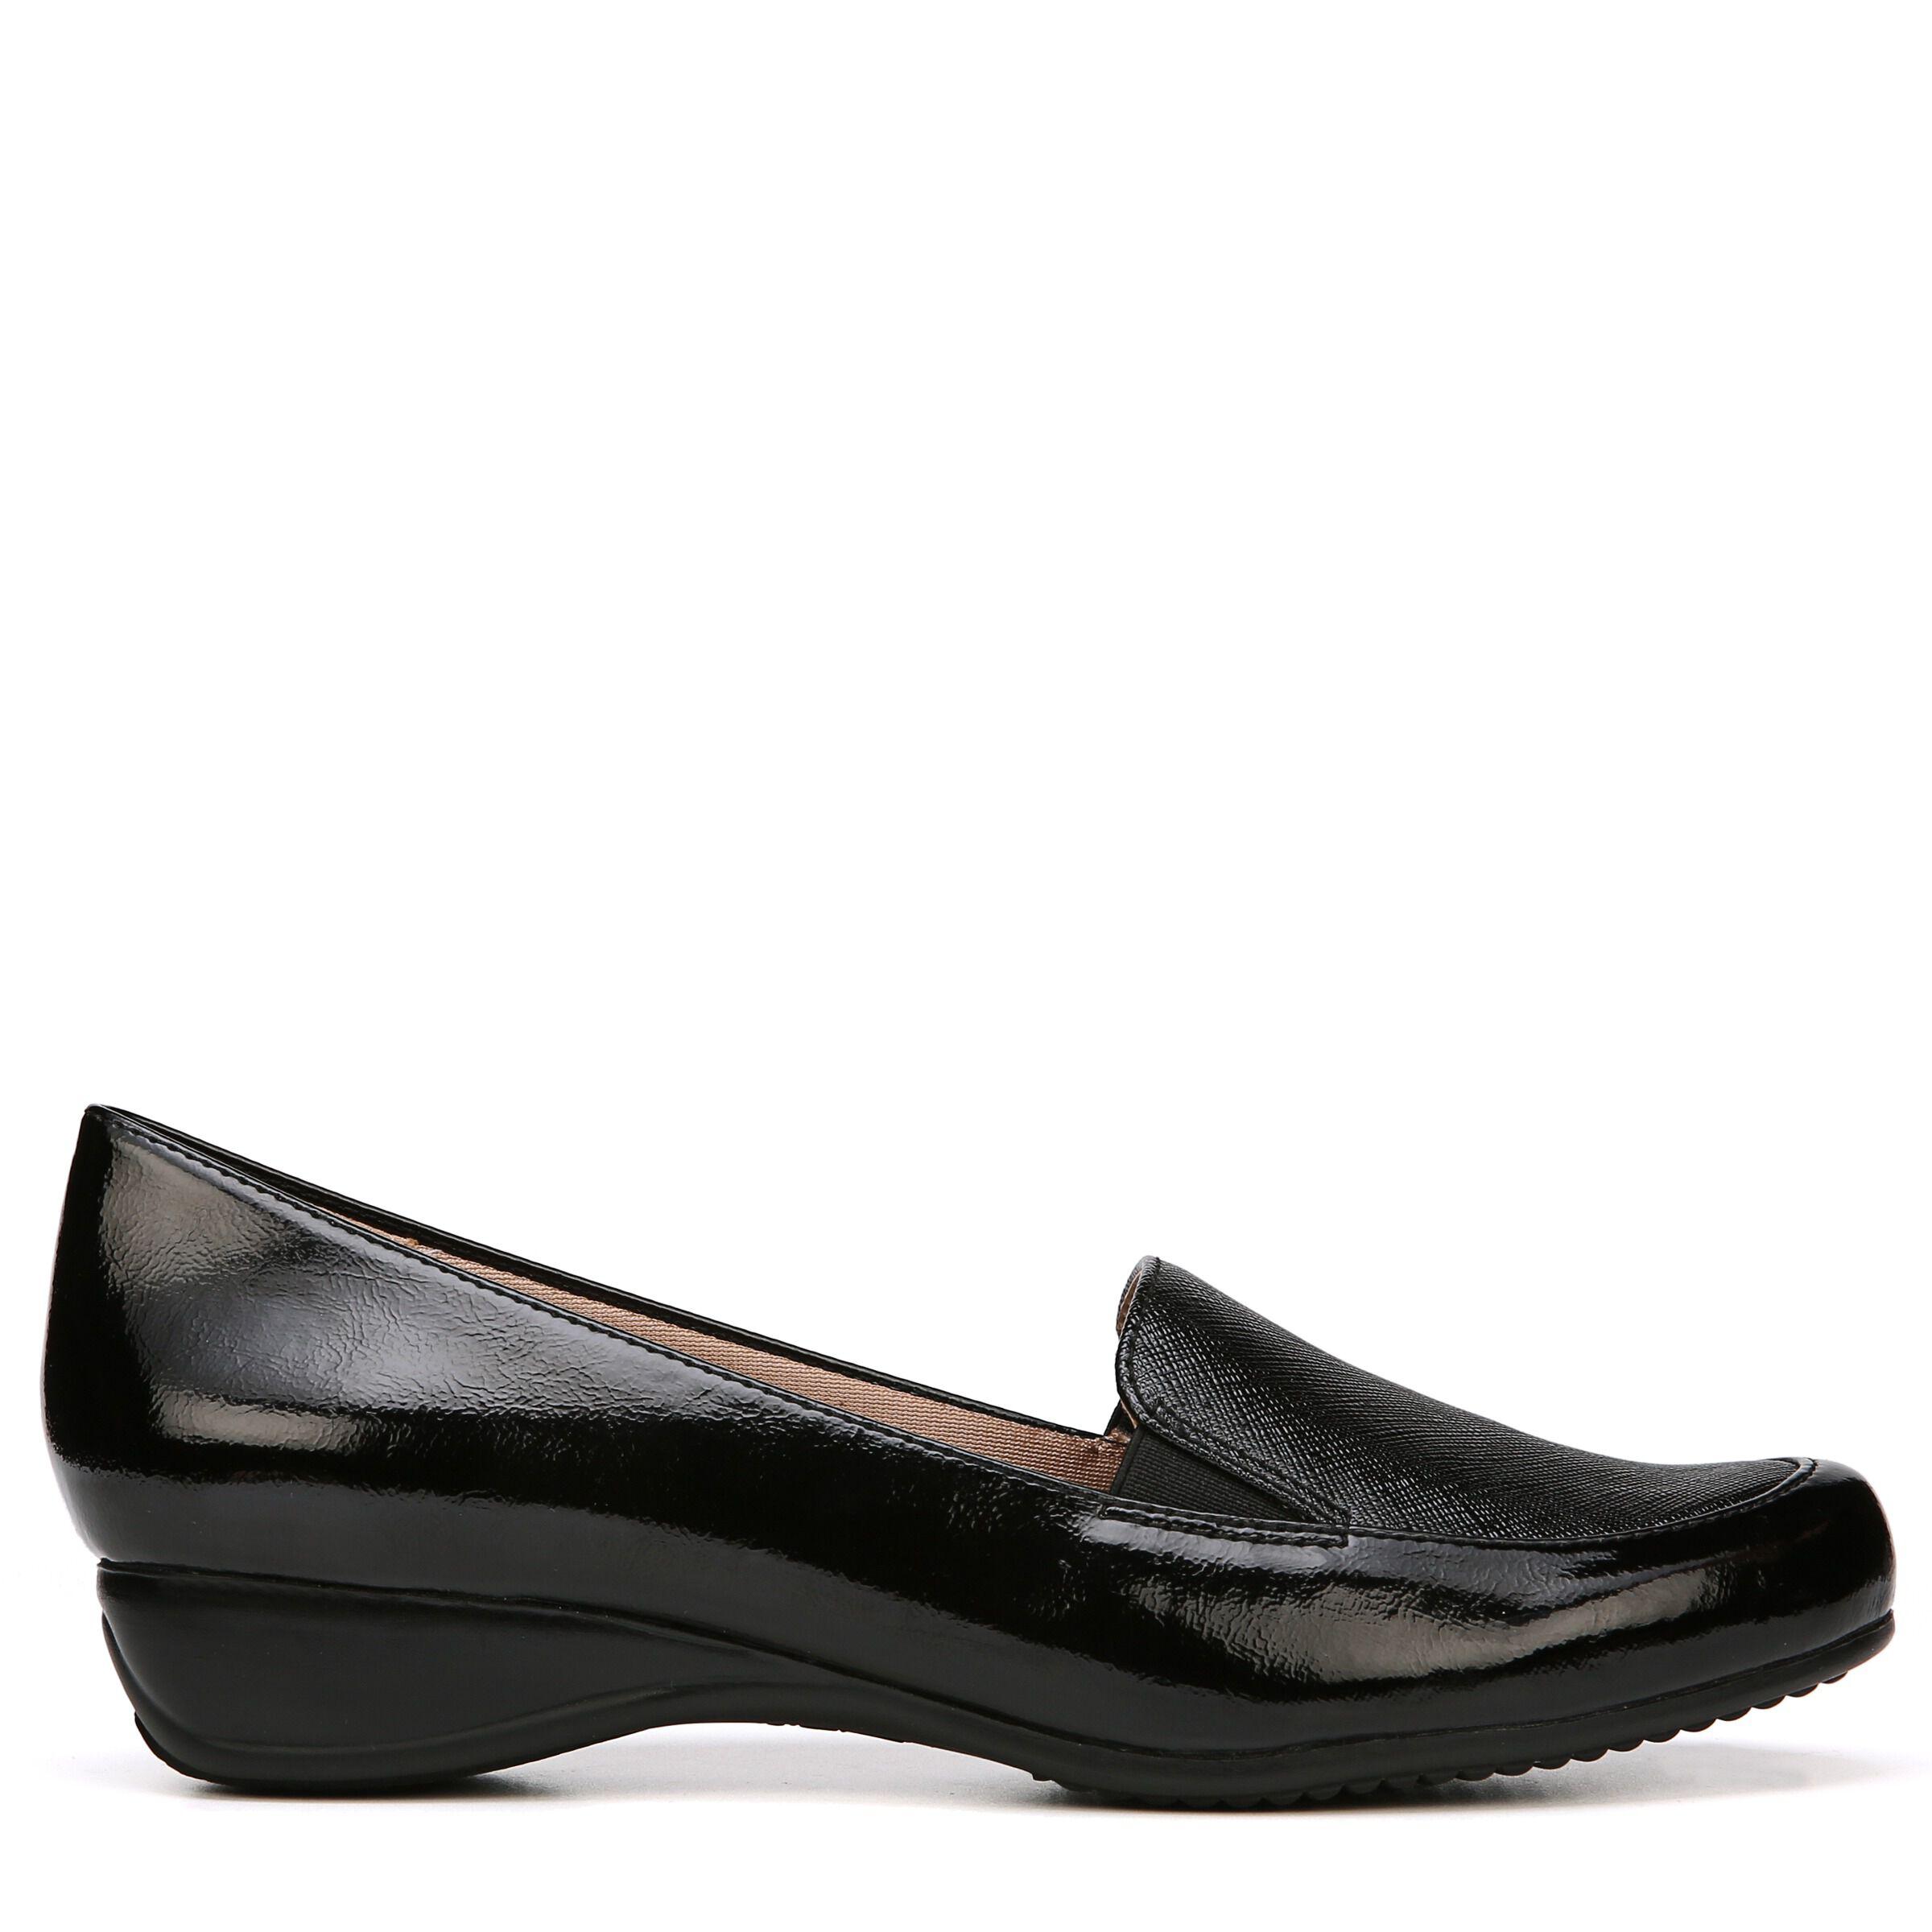 Women's LifeStride Dara Shoes Black